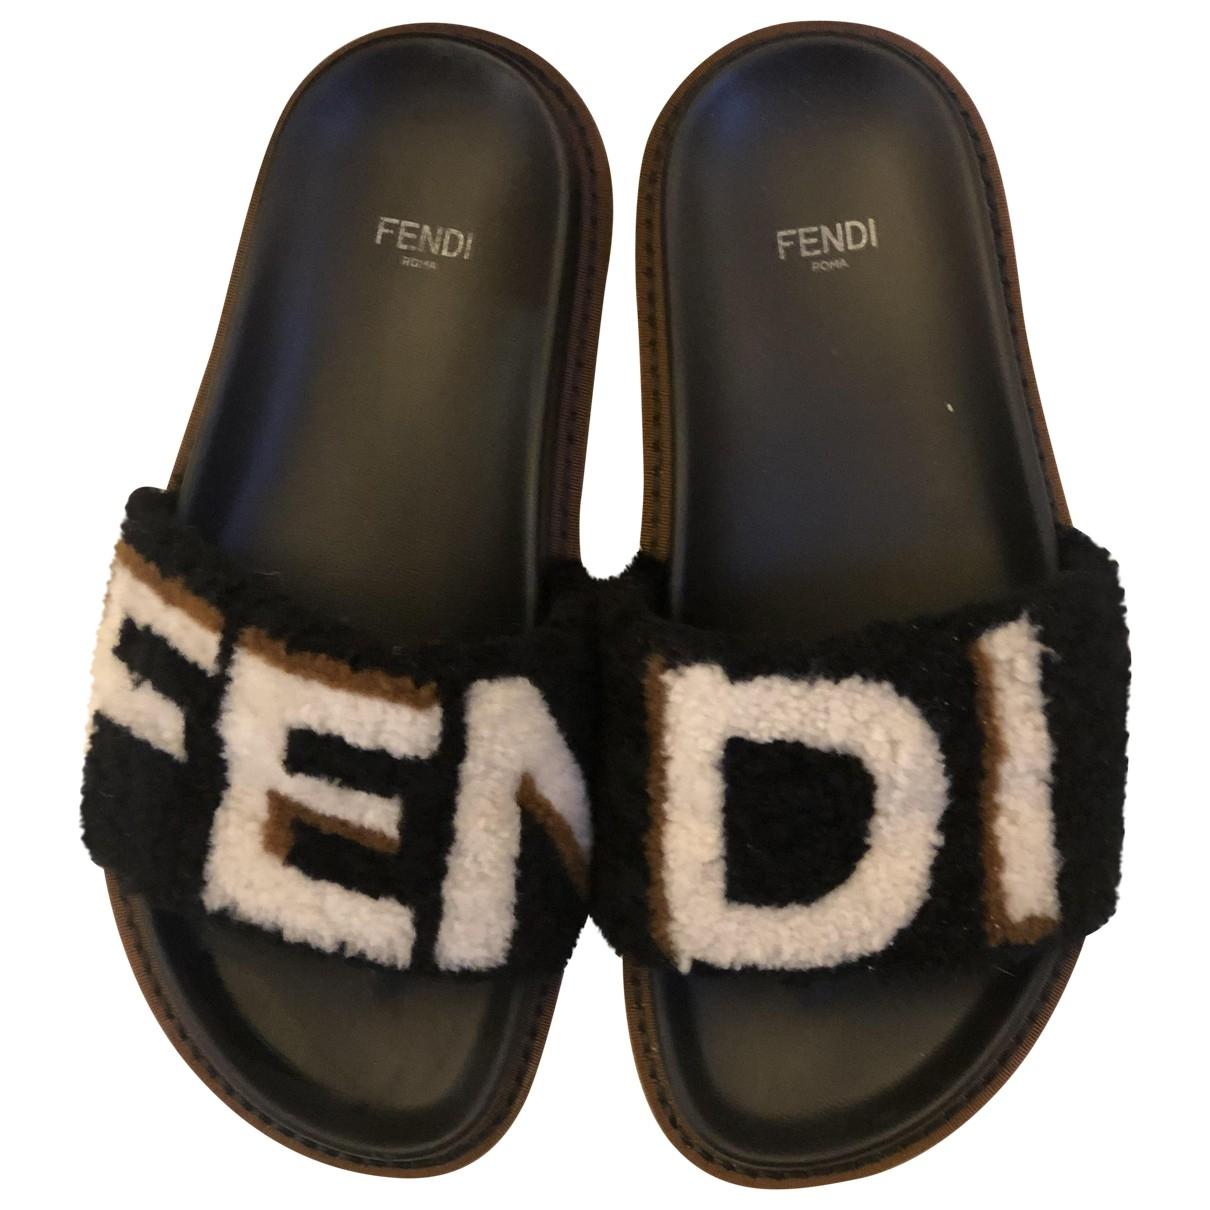 Fendi \N Black Shearling Sandals for Women 36 EU